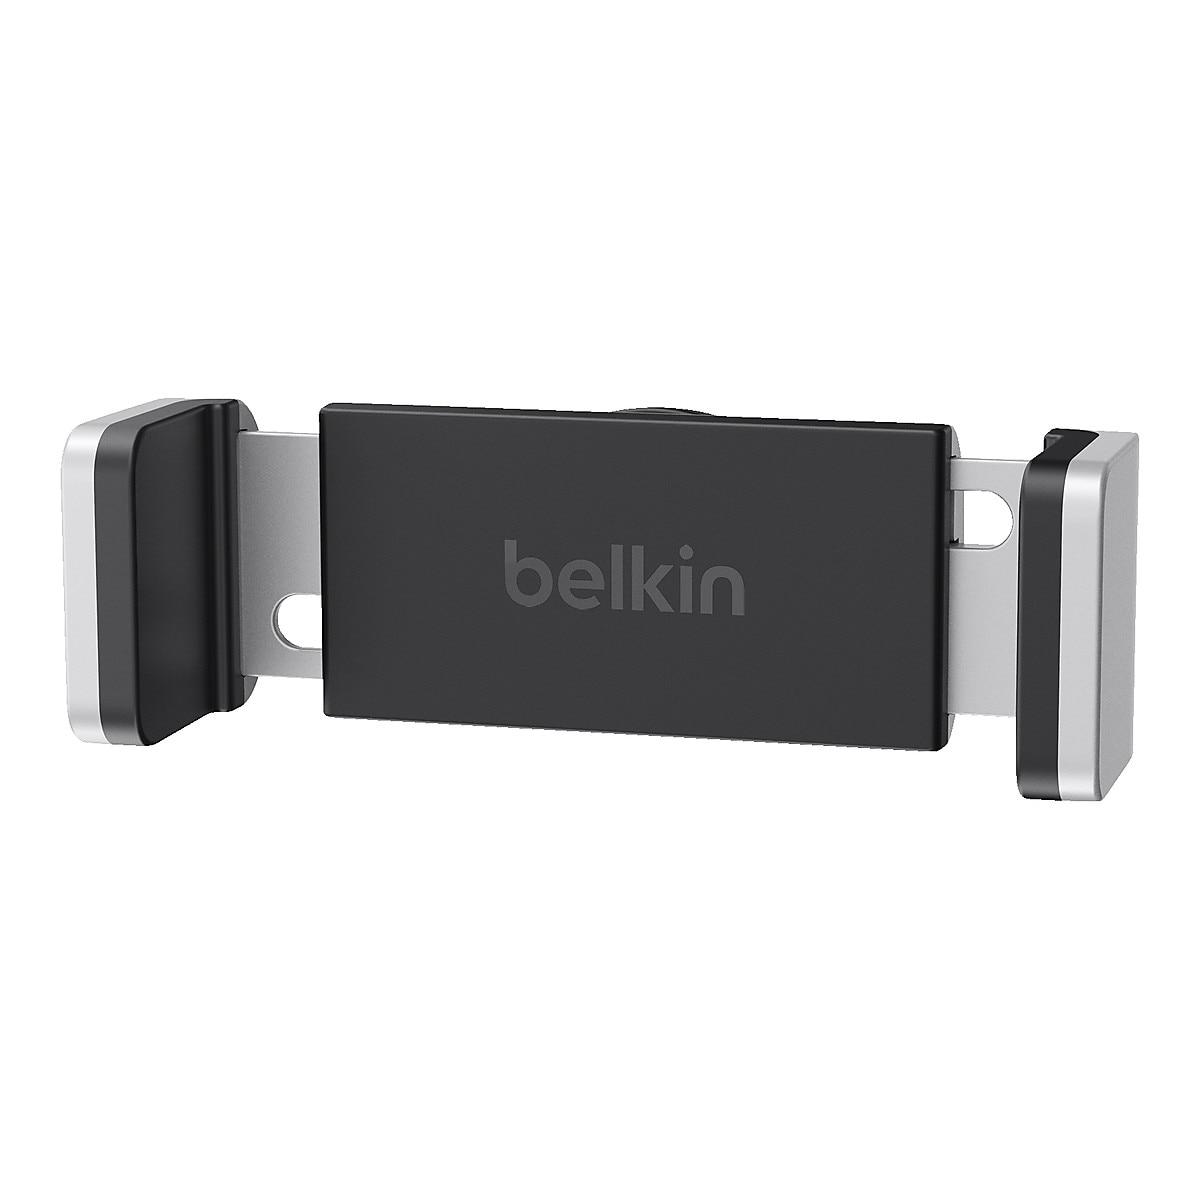 Belkin Vent Mount telefonholder